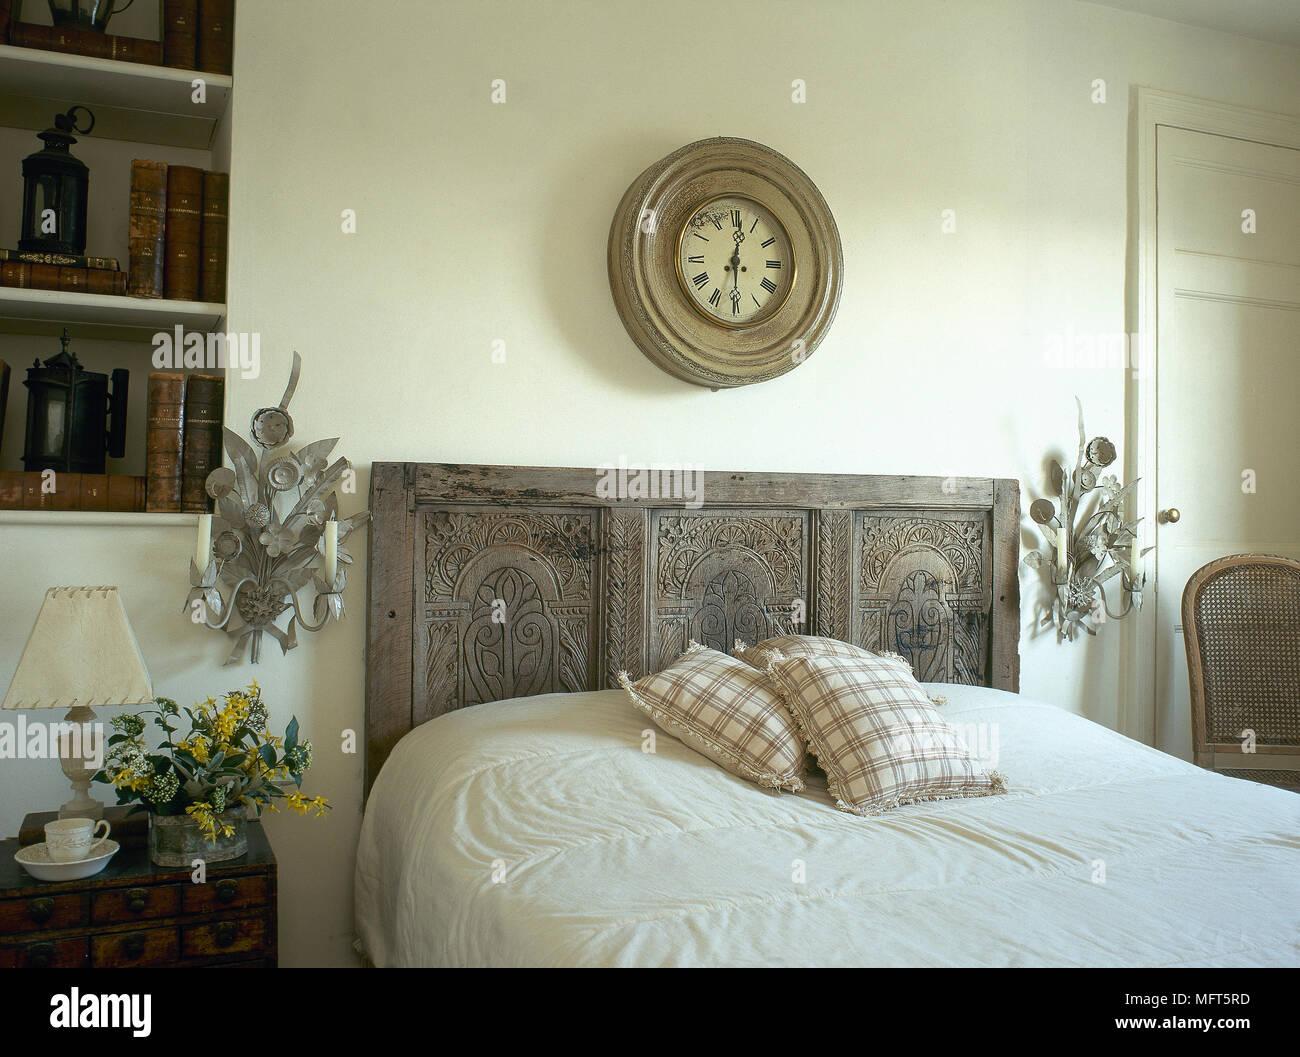 Candele Camera Da Letto : Un paese di bianco in stile camera da letto con letto matrimoniale